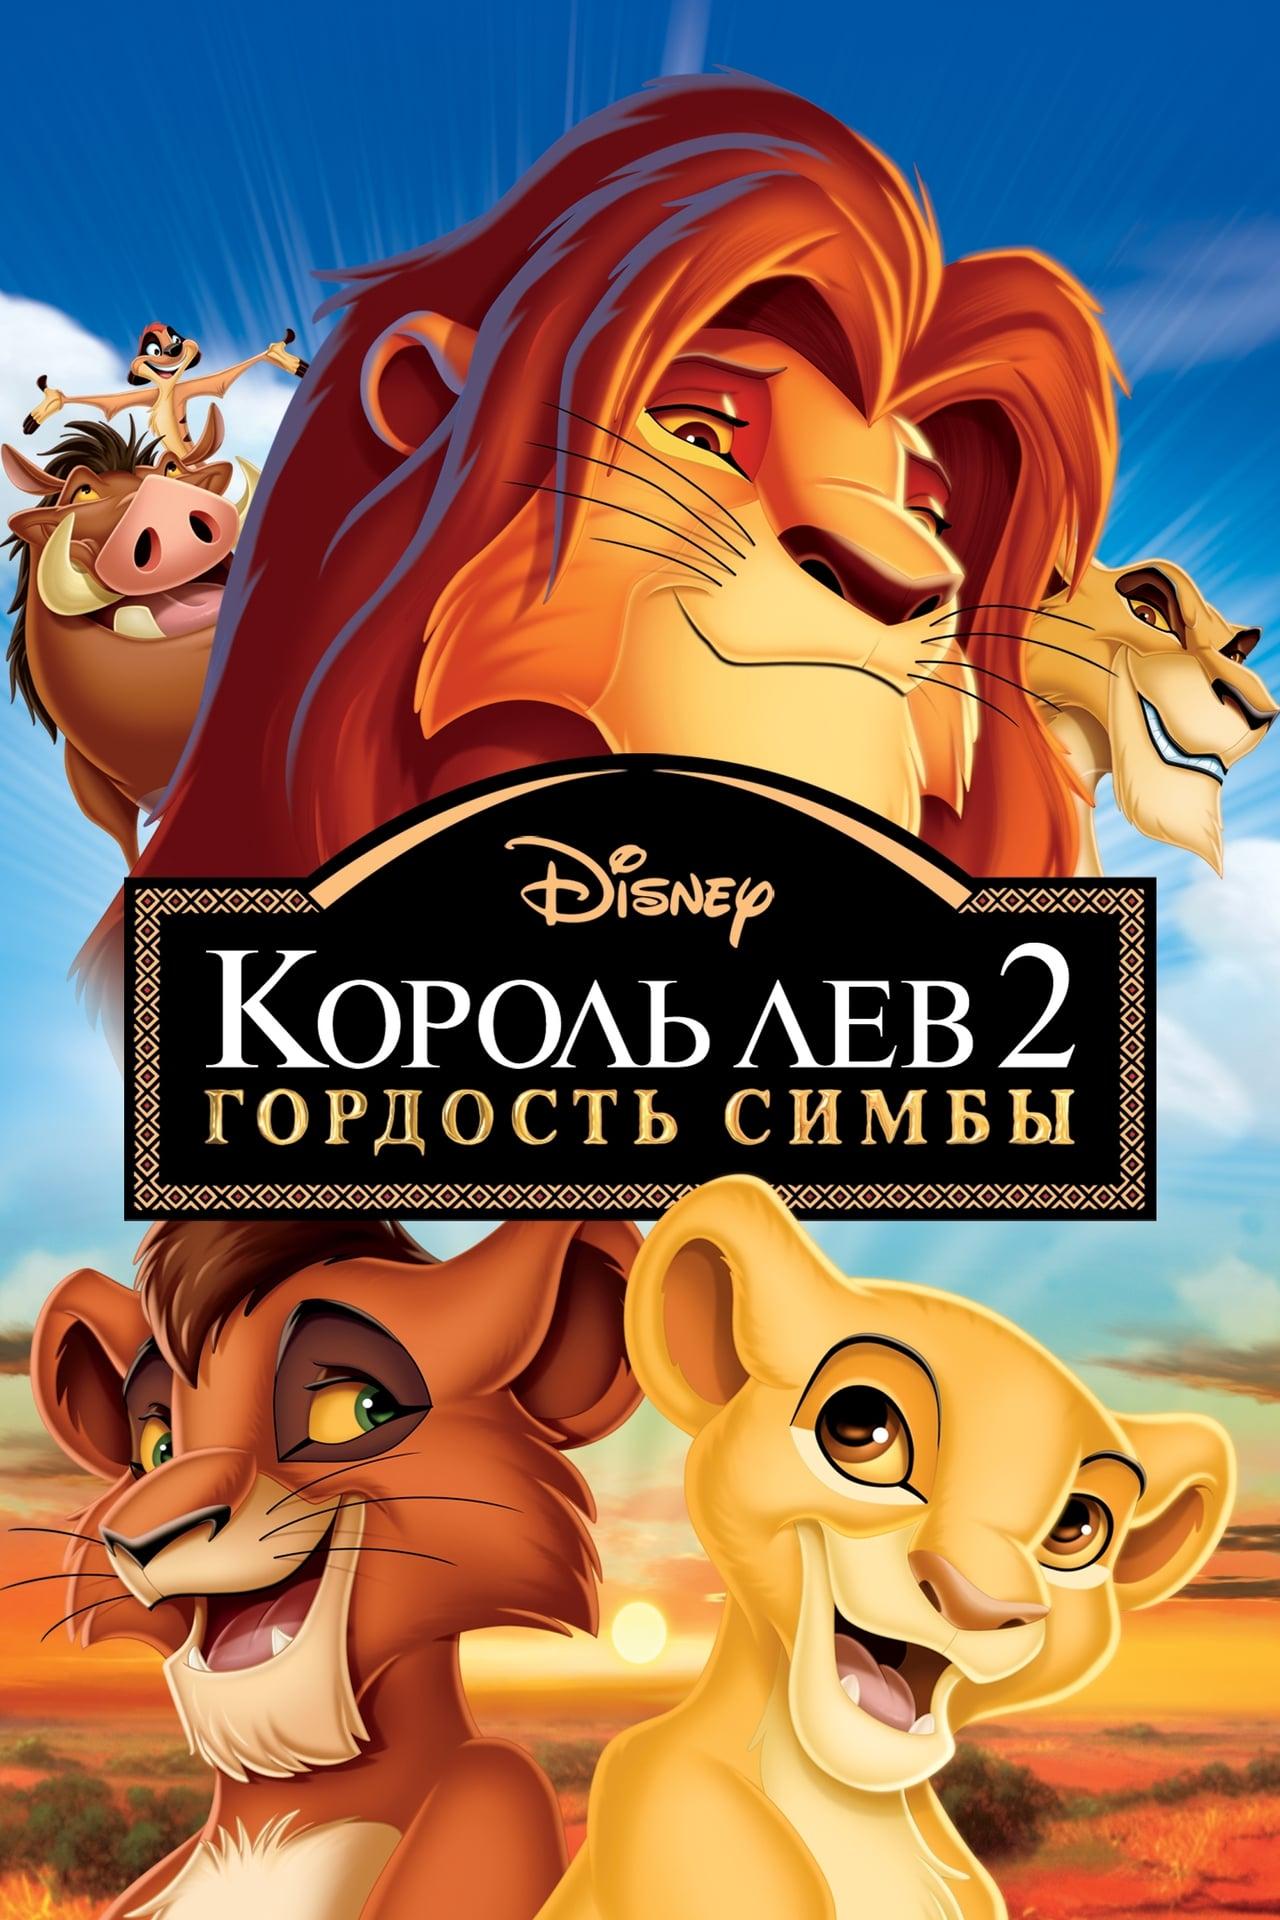 dev 2004 full movie free download